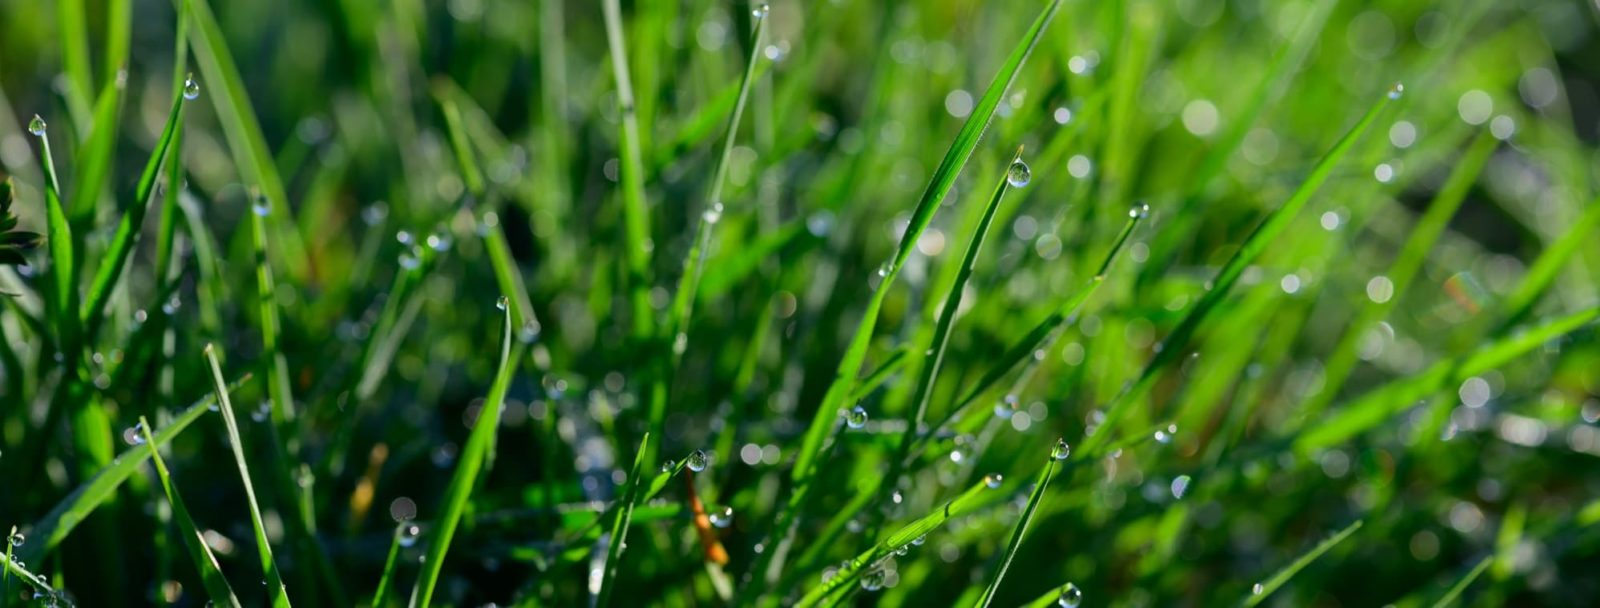 morning dew on lush green lawn